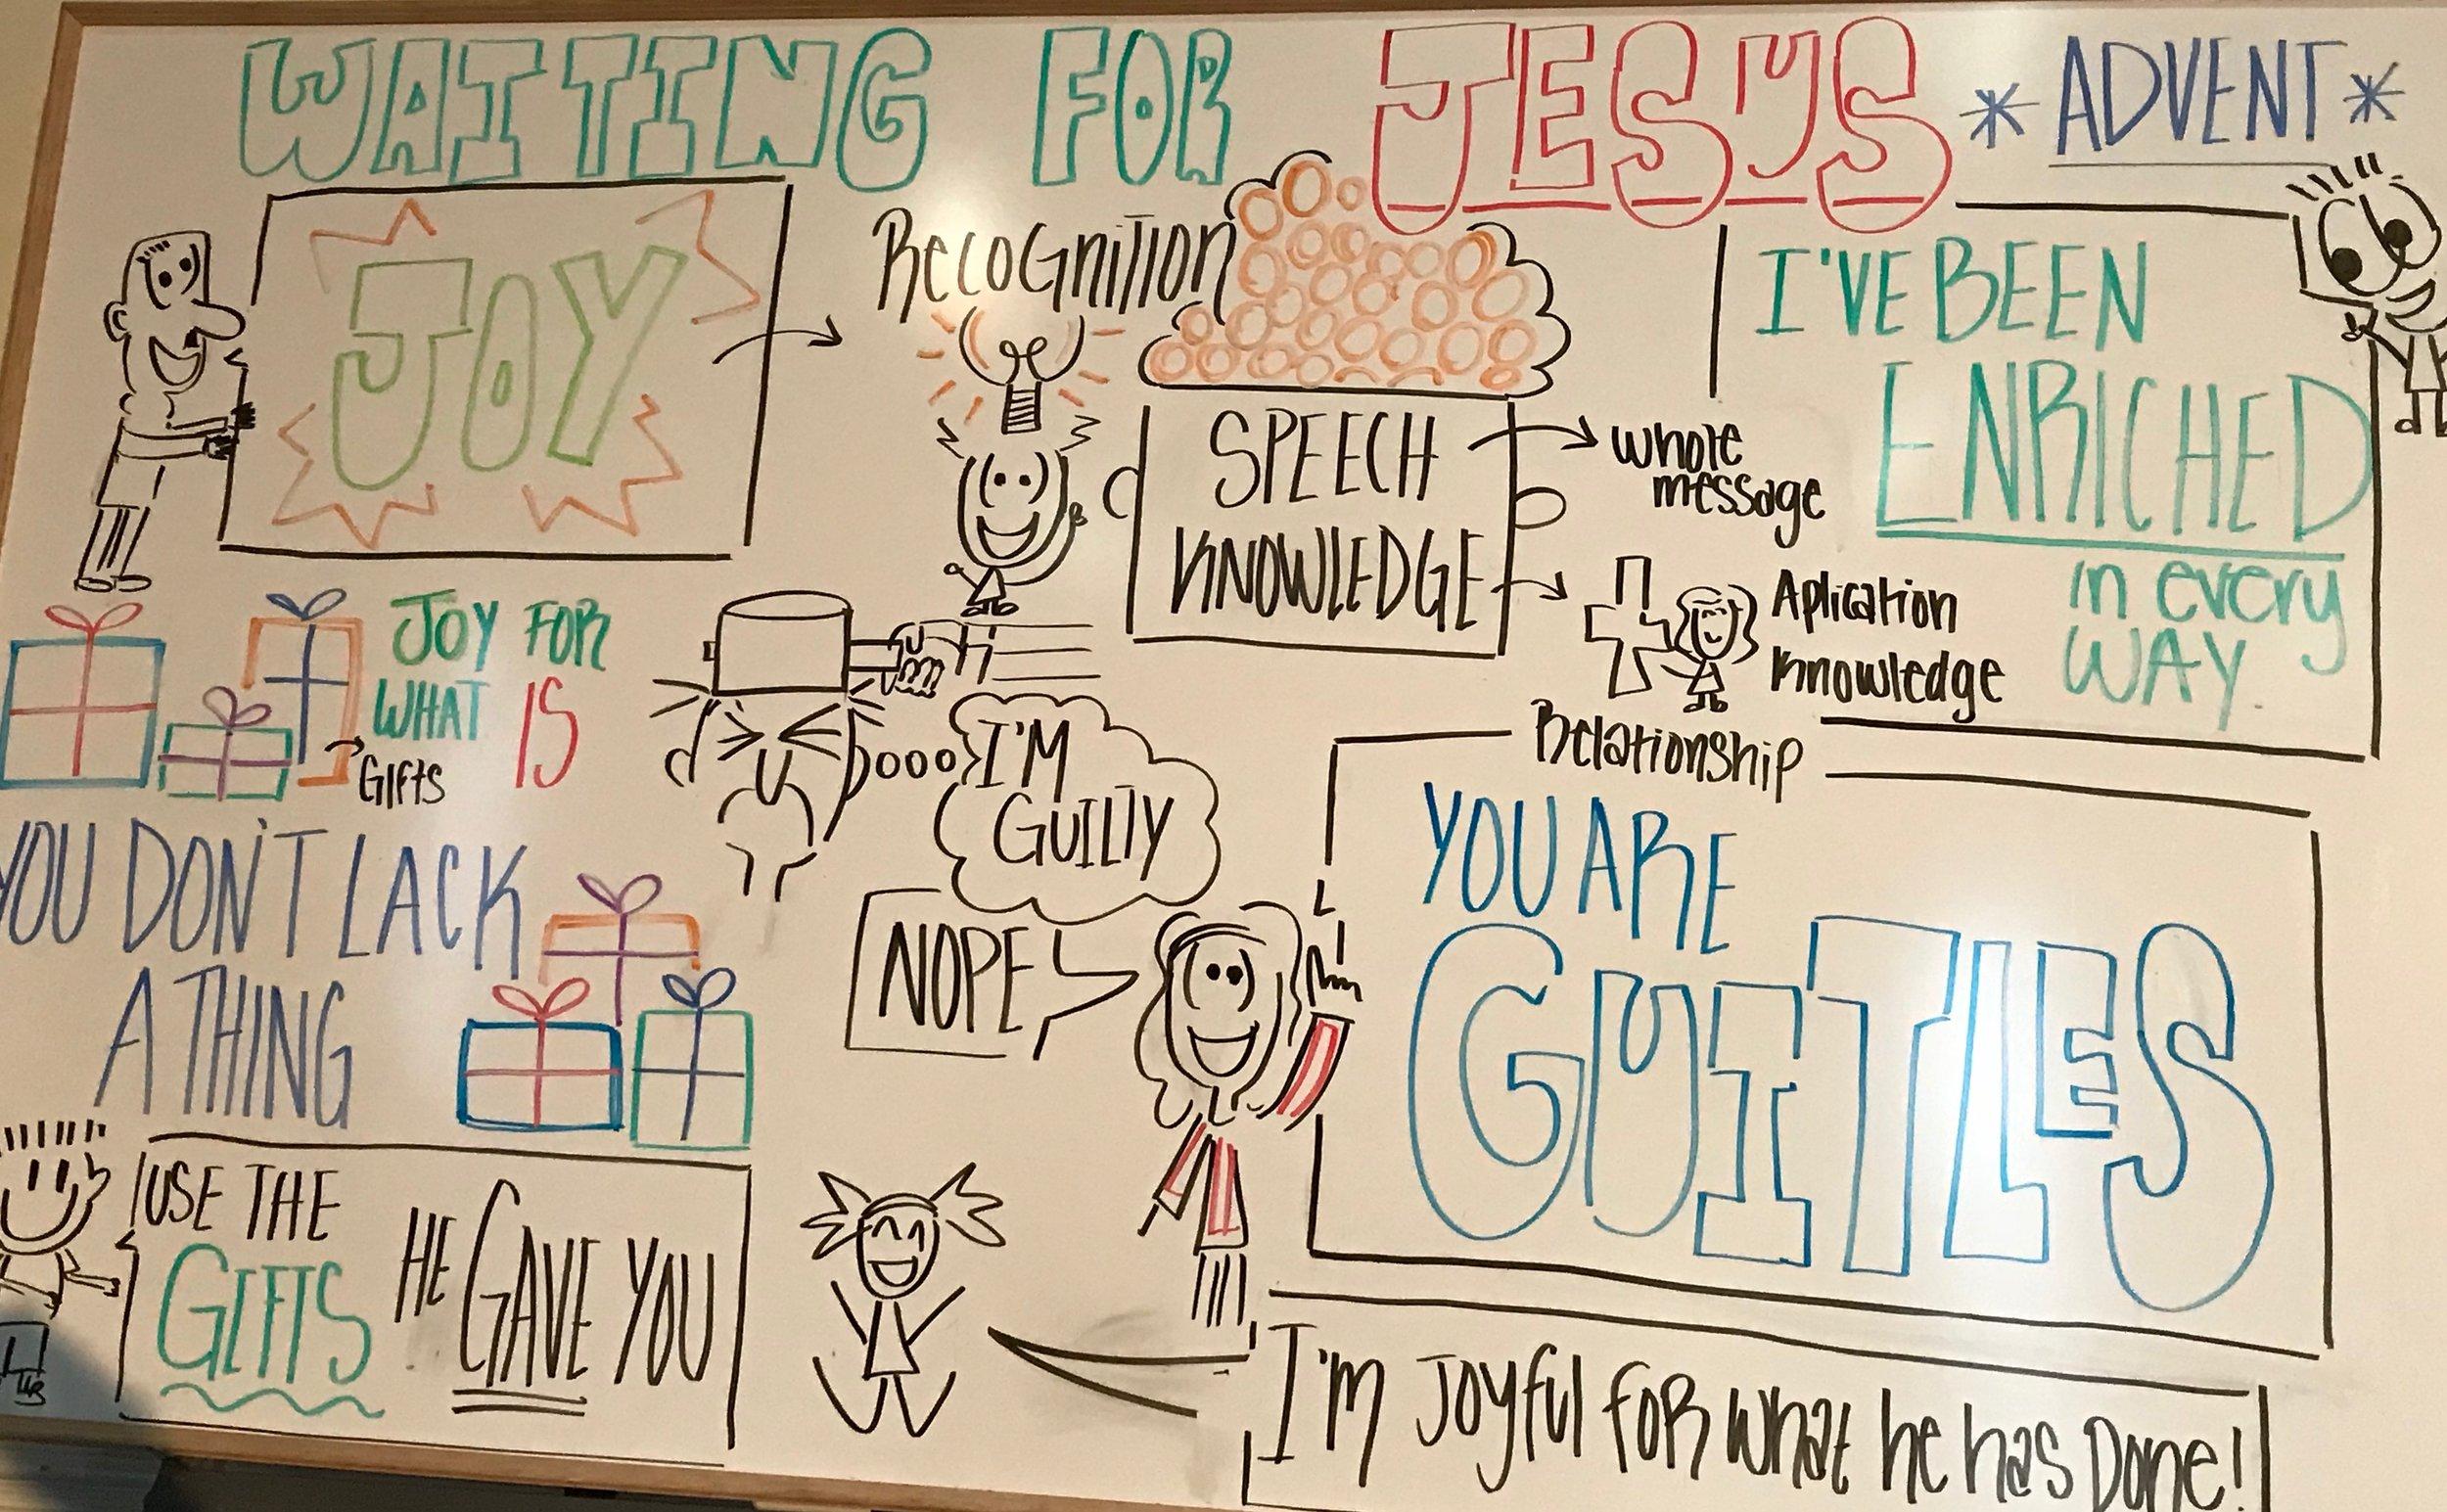 Storyboard by Manuela Cox from 12/16/18 - JOY